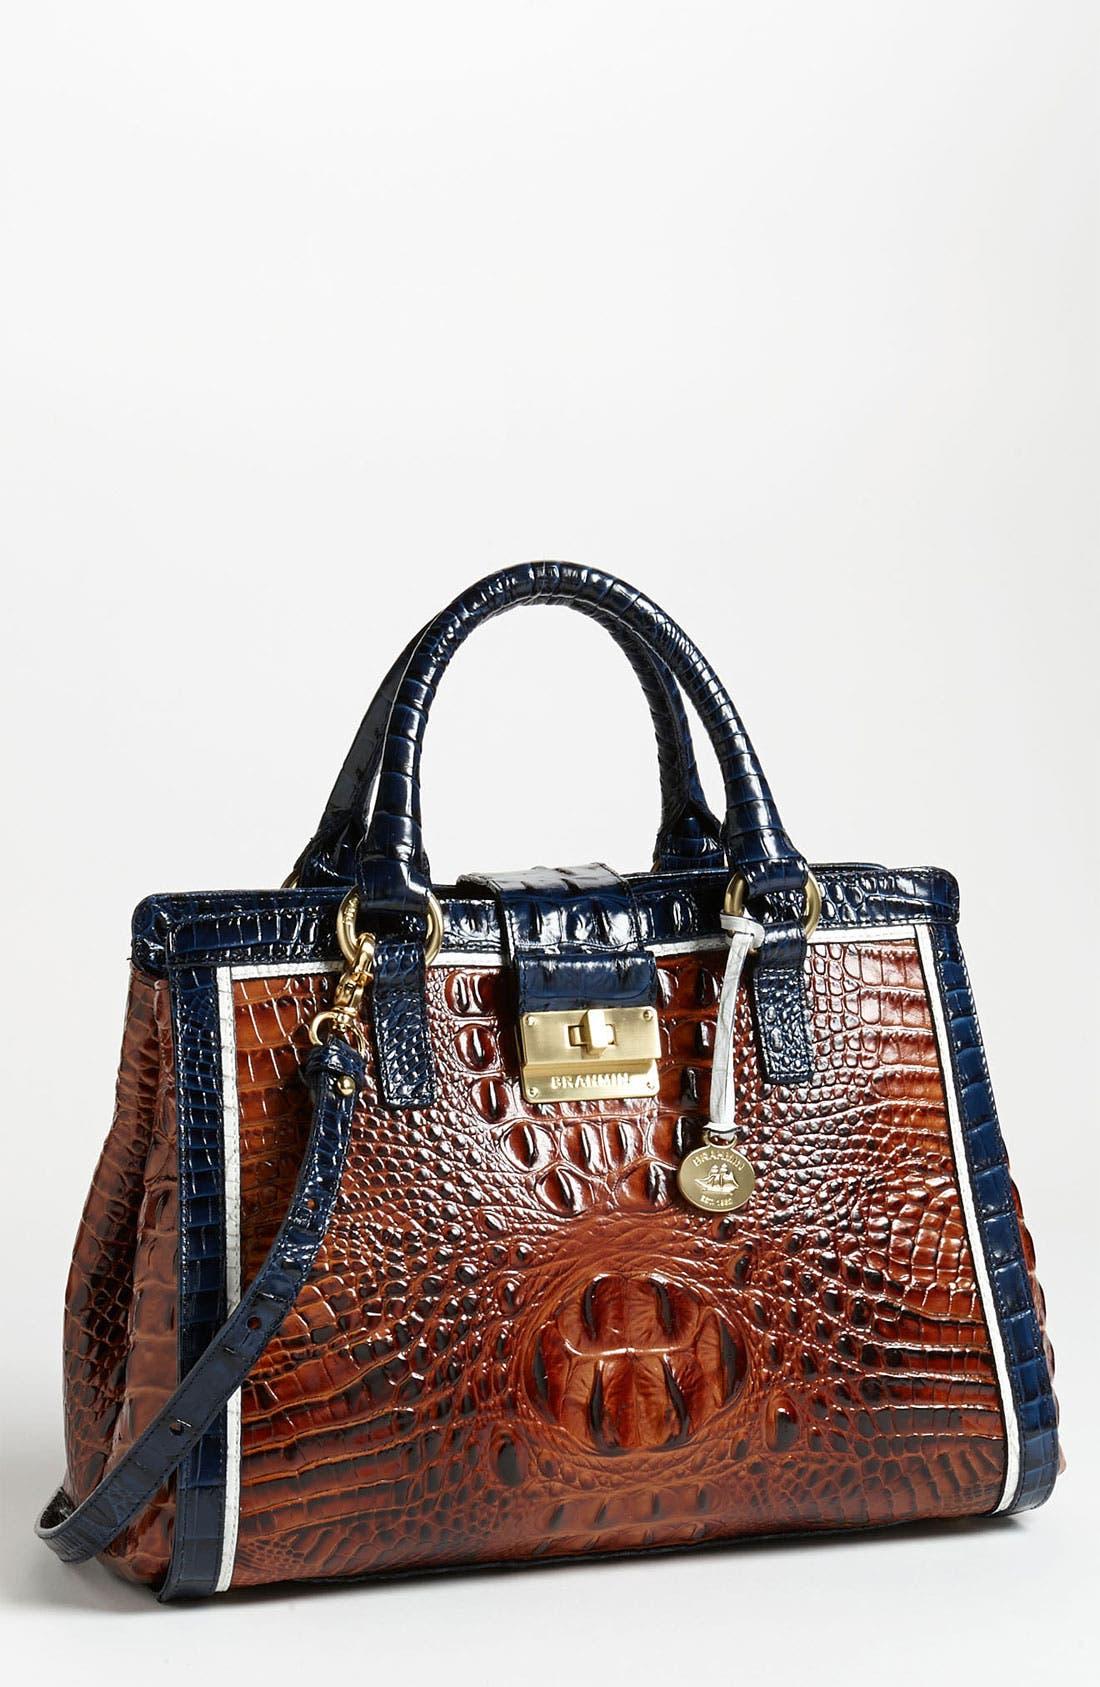 Alternate Image 1 Selected - Brahmin 'Tri Color Annabelle' Handbag